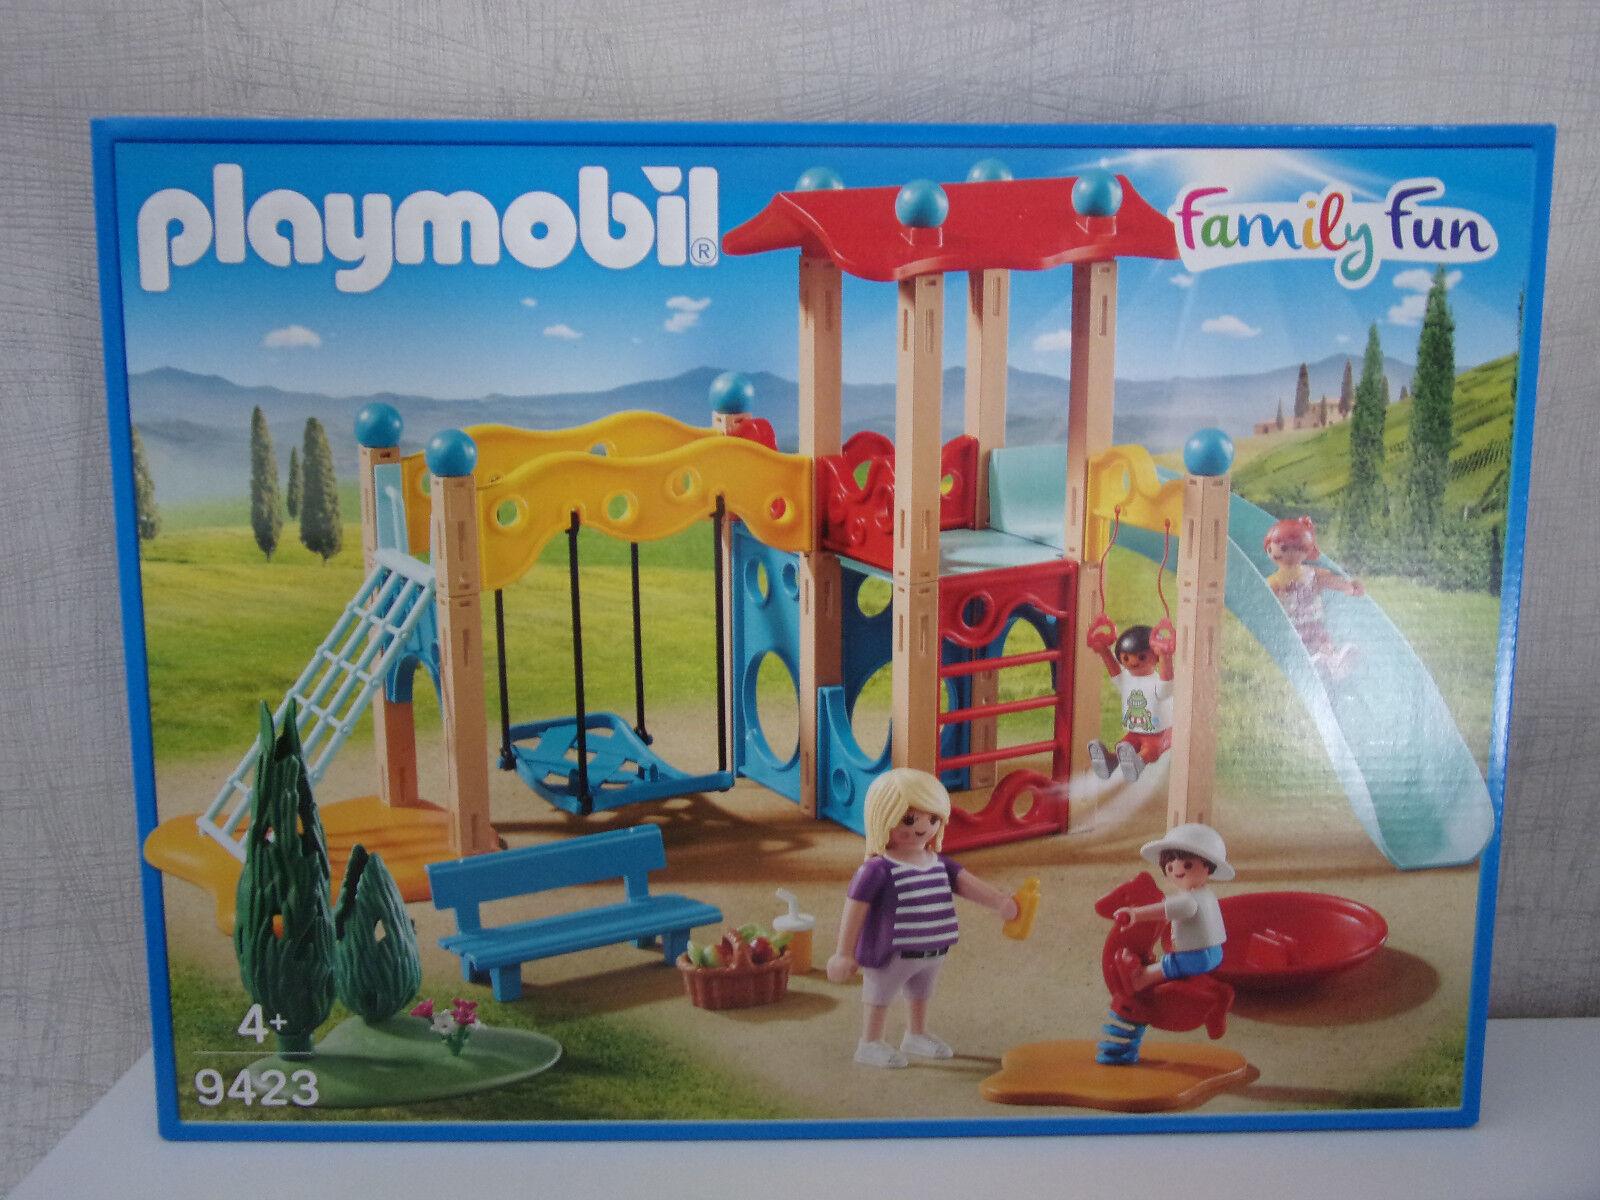 Playmobil Family Fun 9423 Großer Spielplatz - Neu & & & OVP 08ab1e